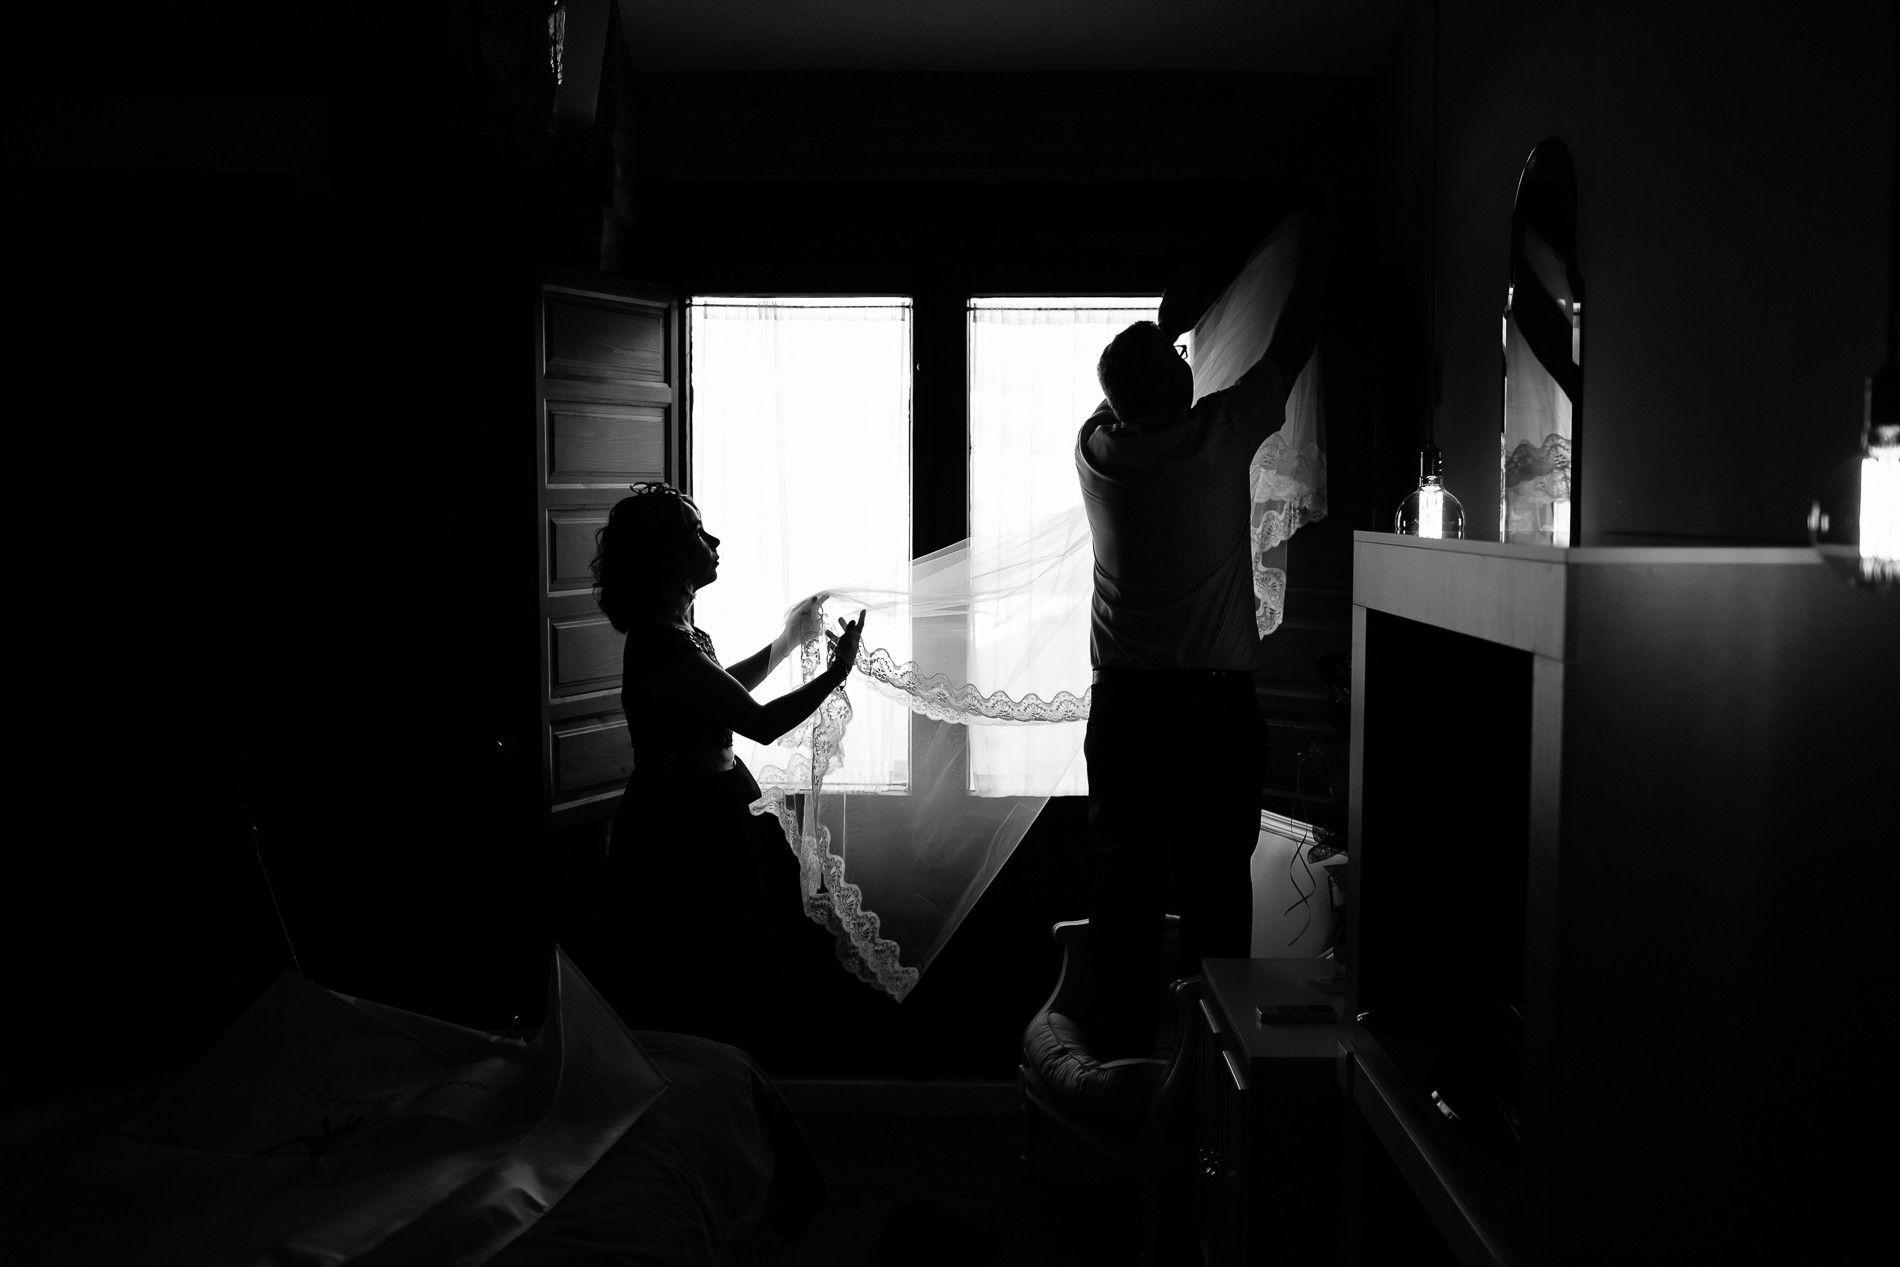 fotografo-de-boda-plasencia-03